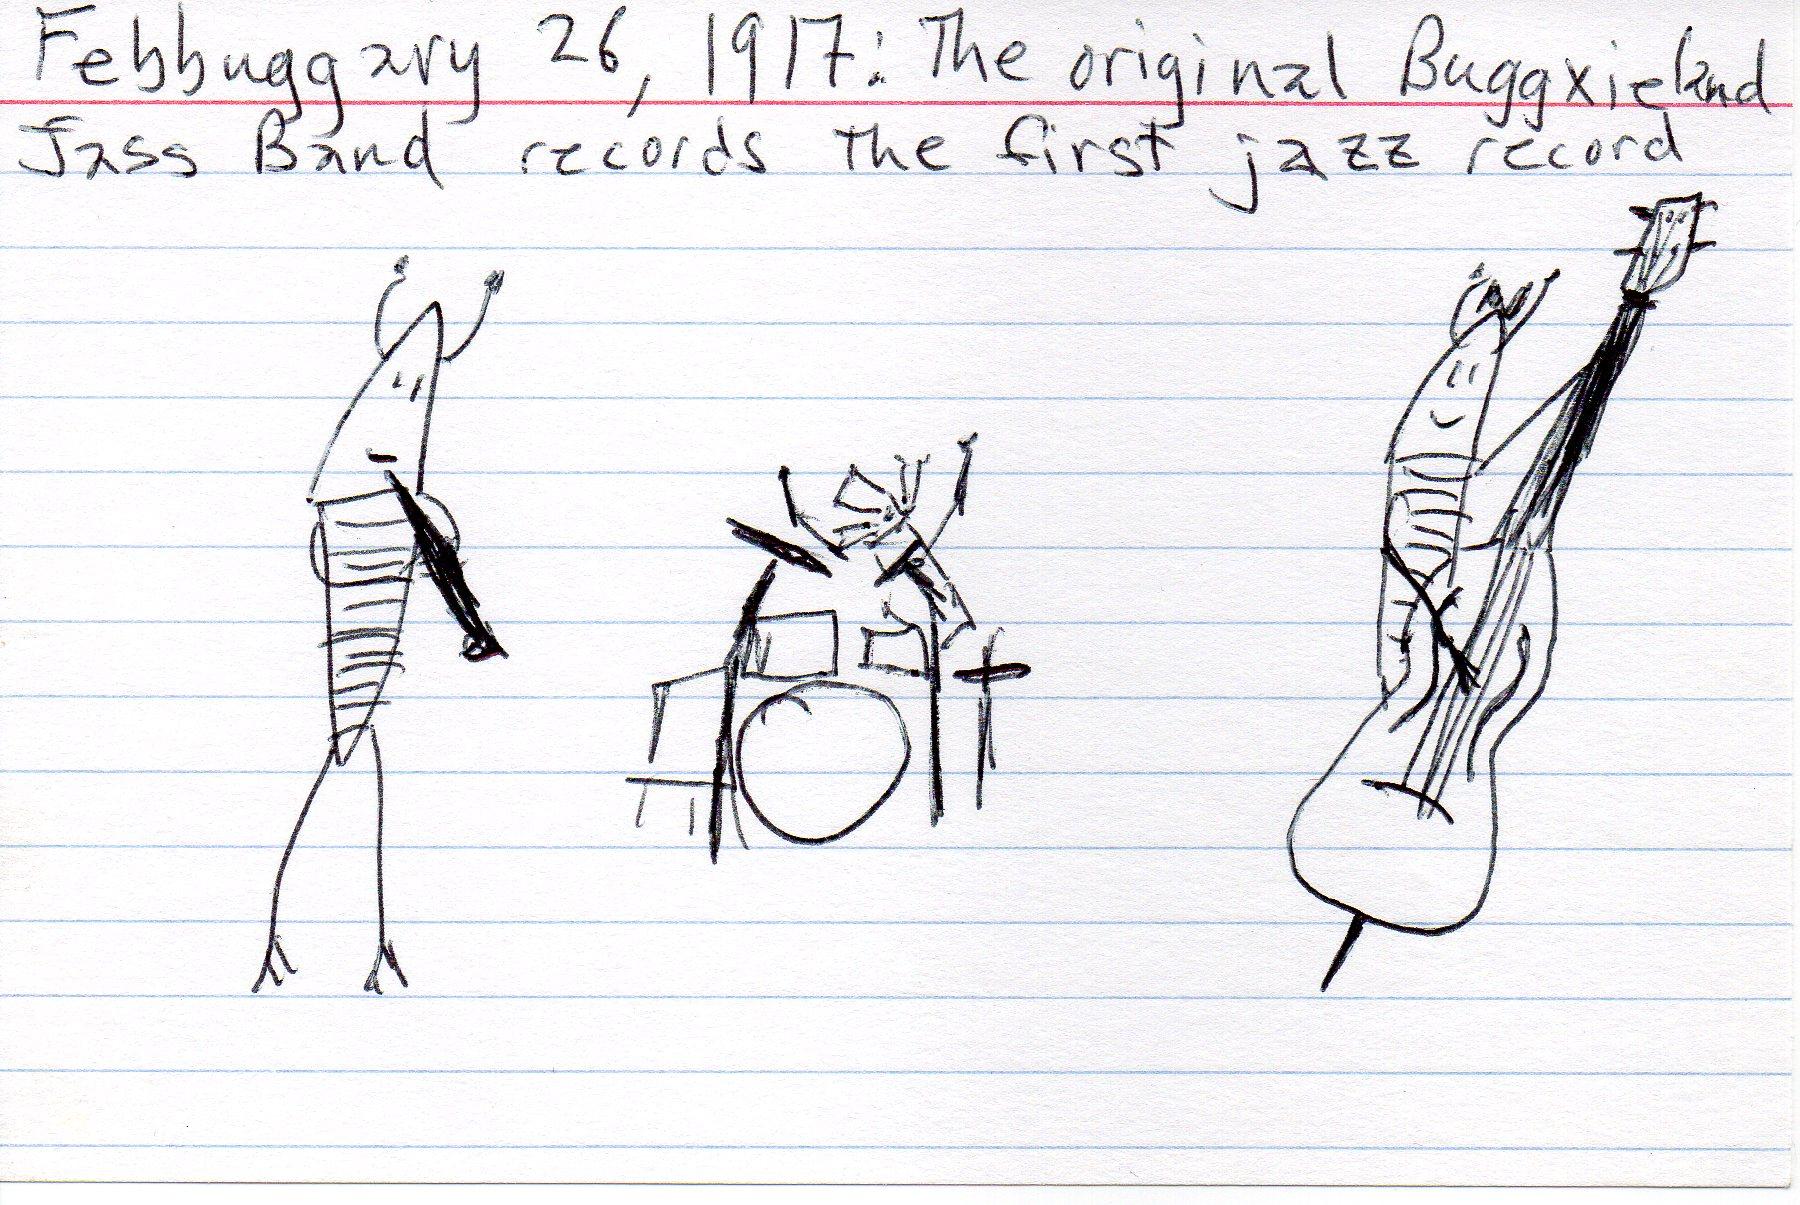 buggxieland jazz [click to embiggen]